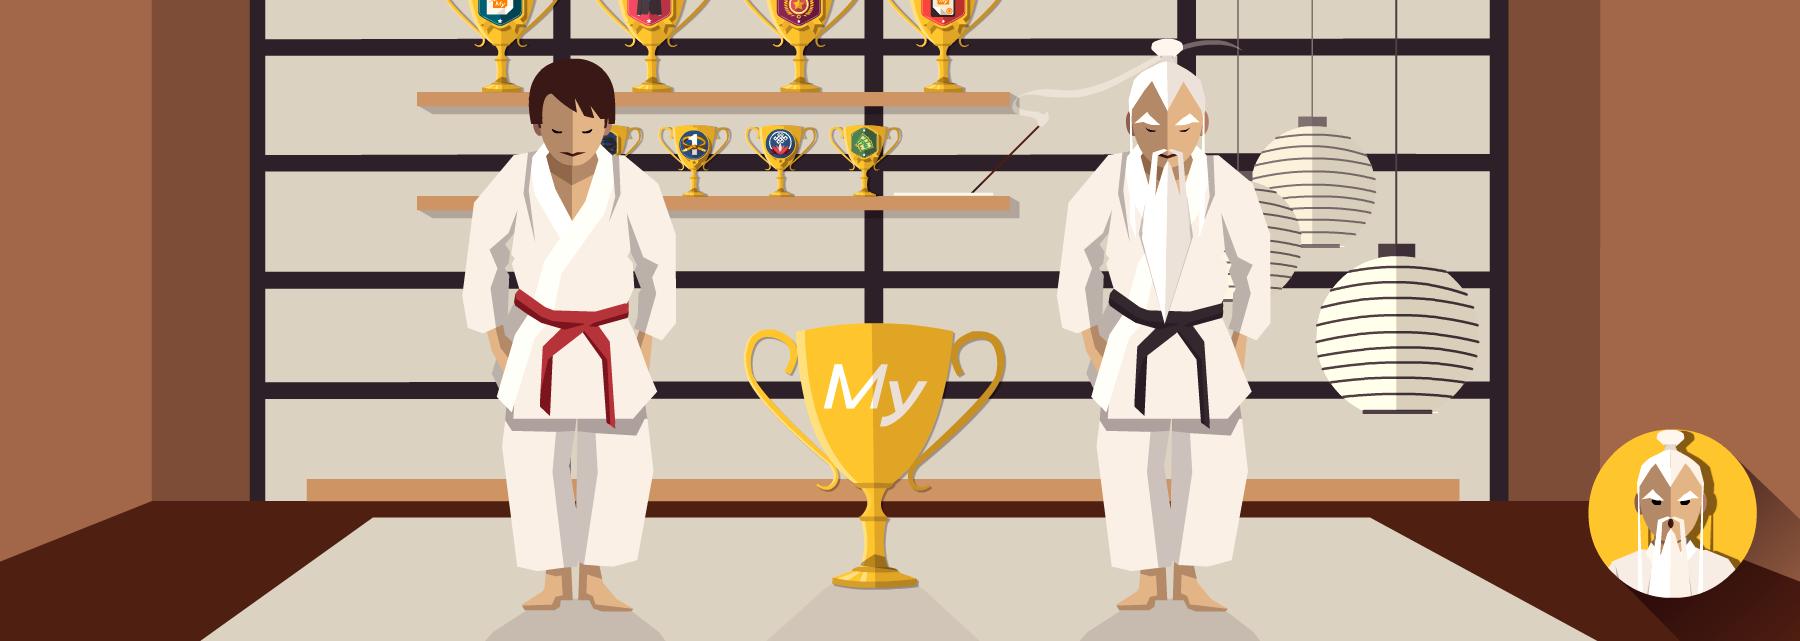 The player's achievements